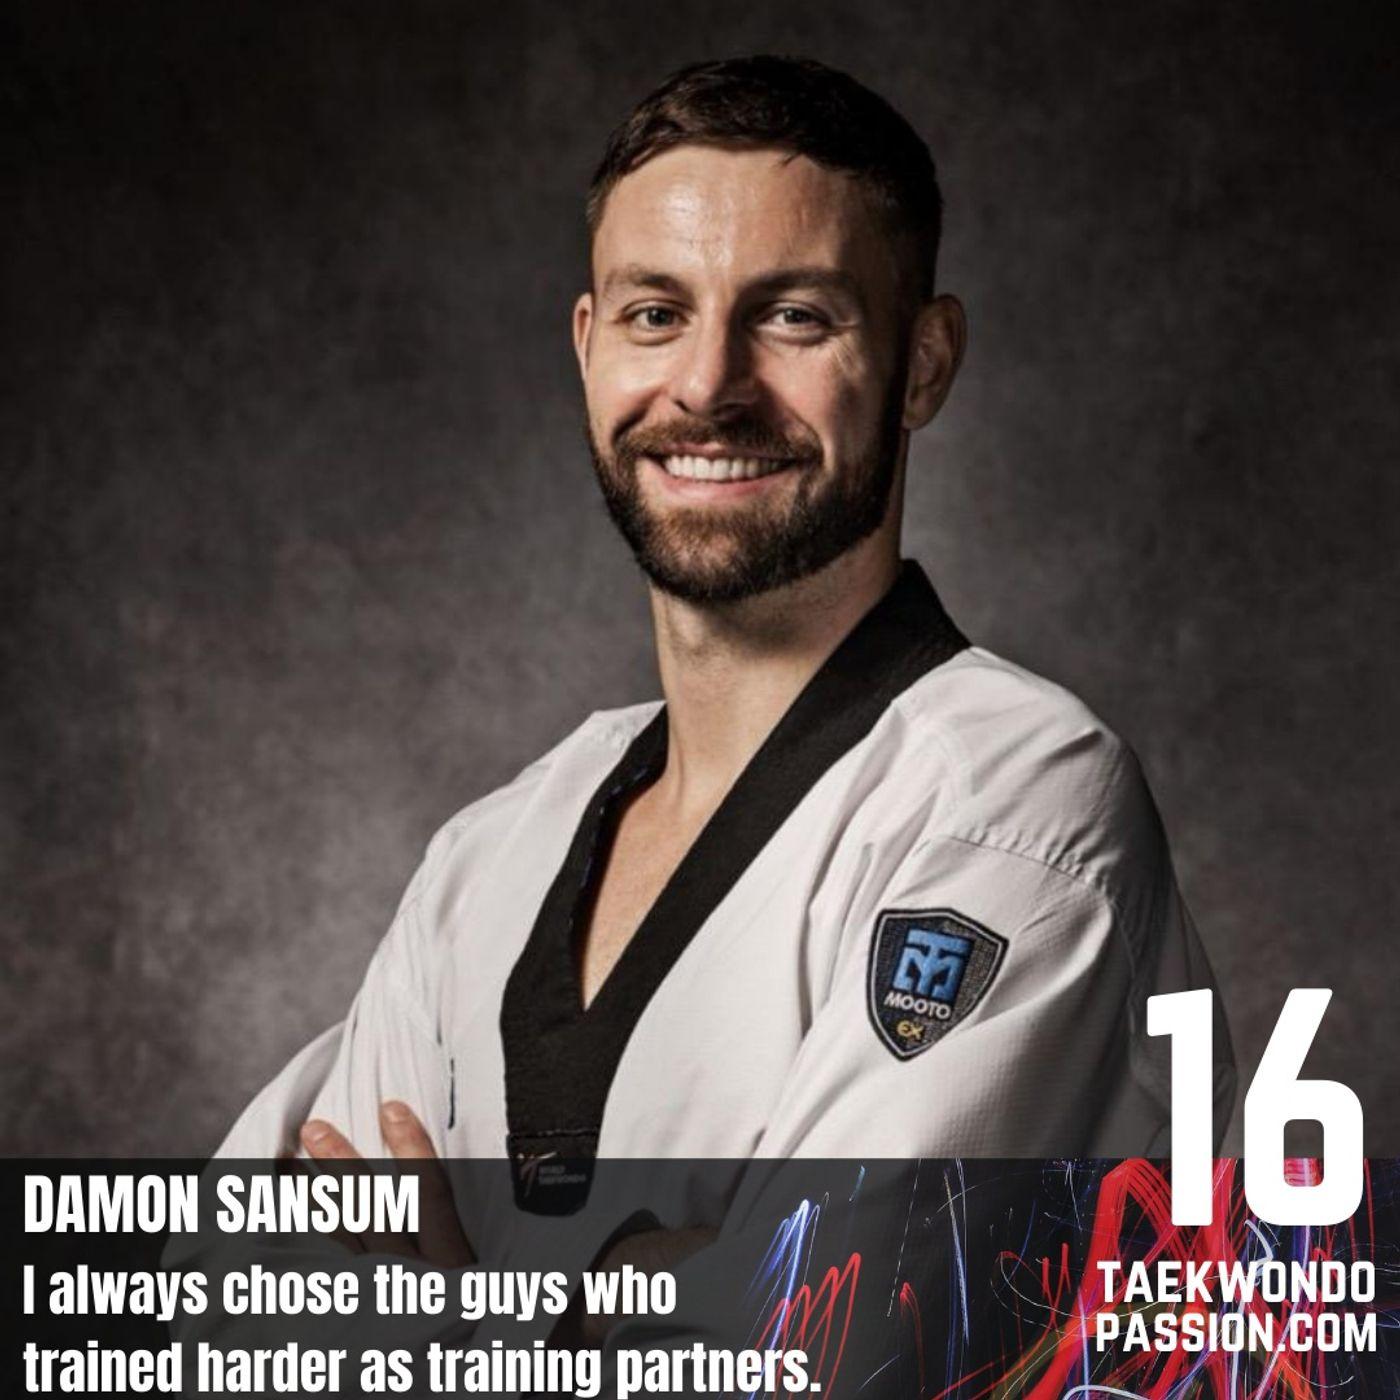 Damon Sansum: I always chose the guys who trained harder as training partners